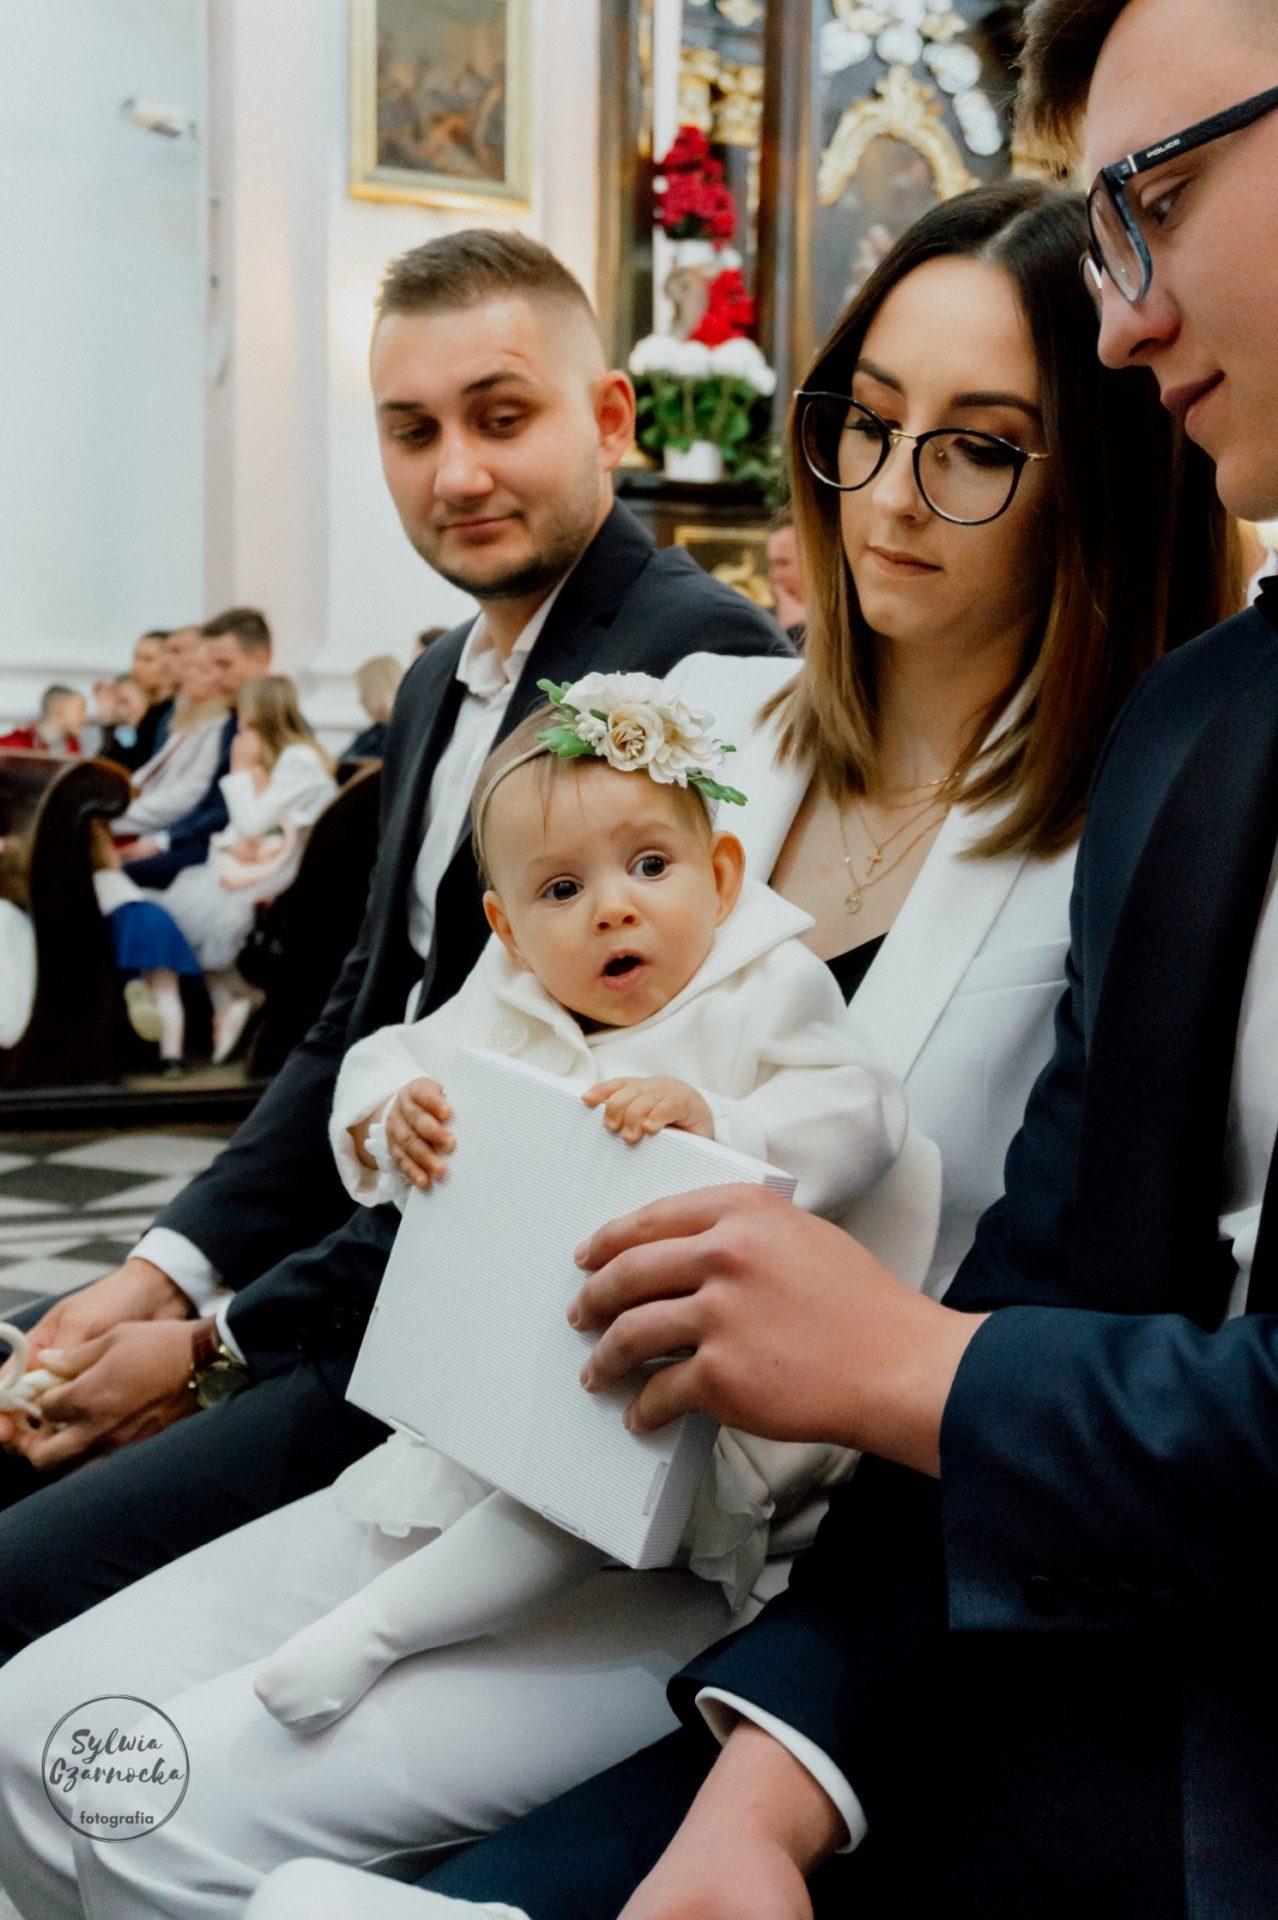 reportaż chrztu świętego